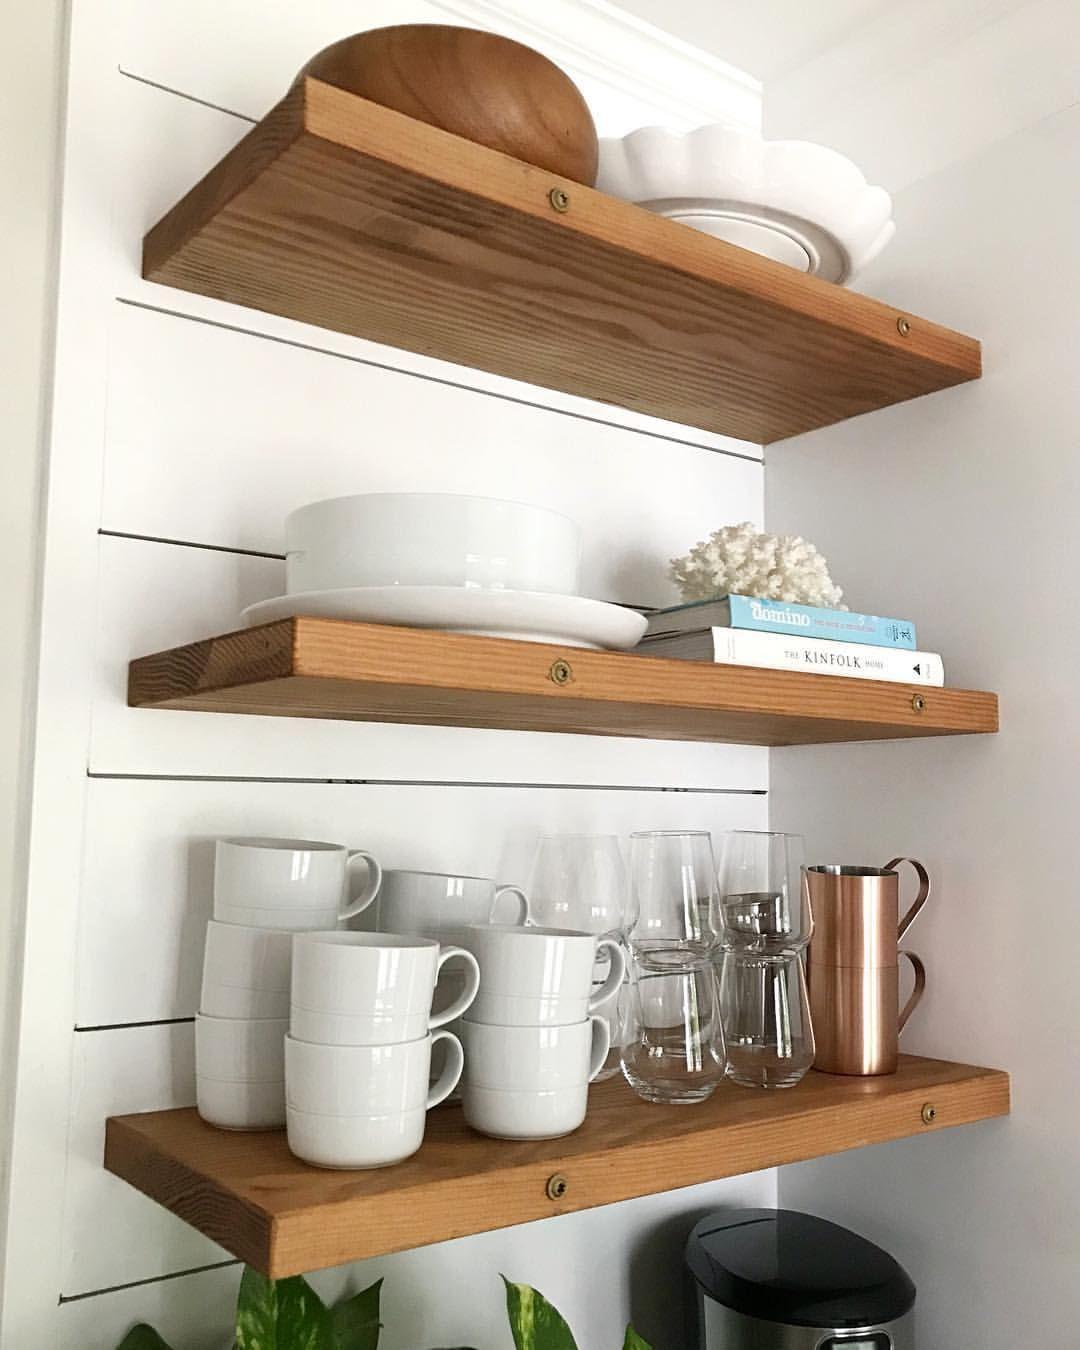 floating kitchen shelves with white dishes kitchenshelves for shelfstyling shiplap fire surround black glass wall shelf dinnerware storage rack best closet design narrow ikea